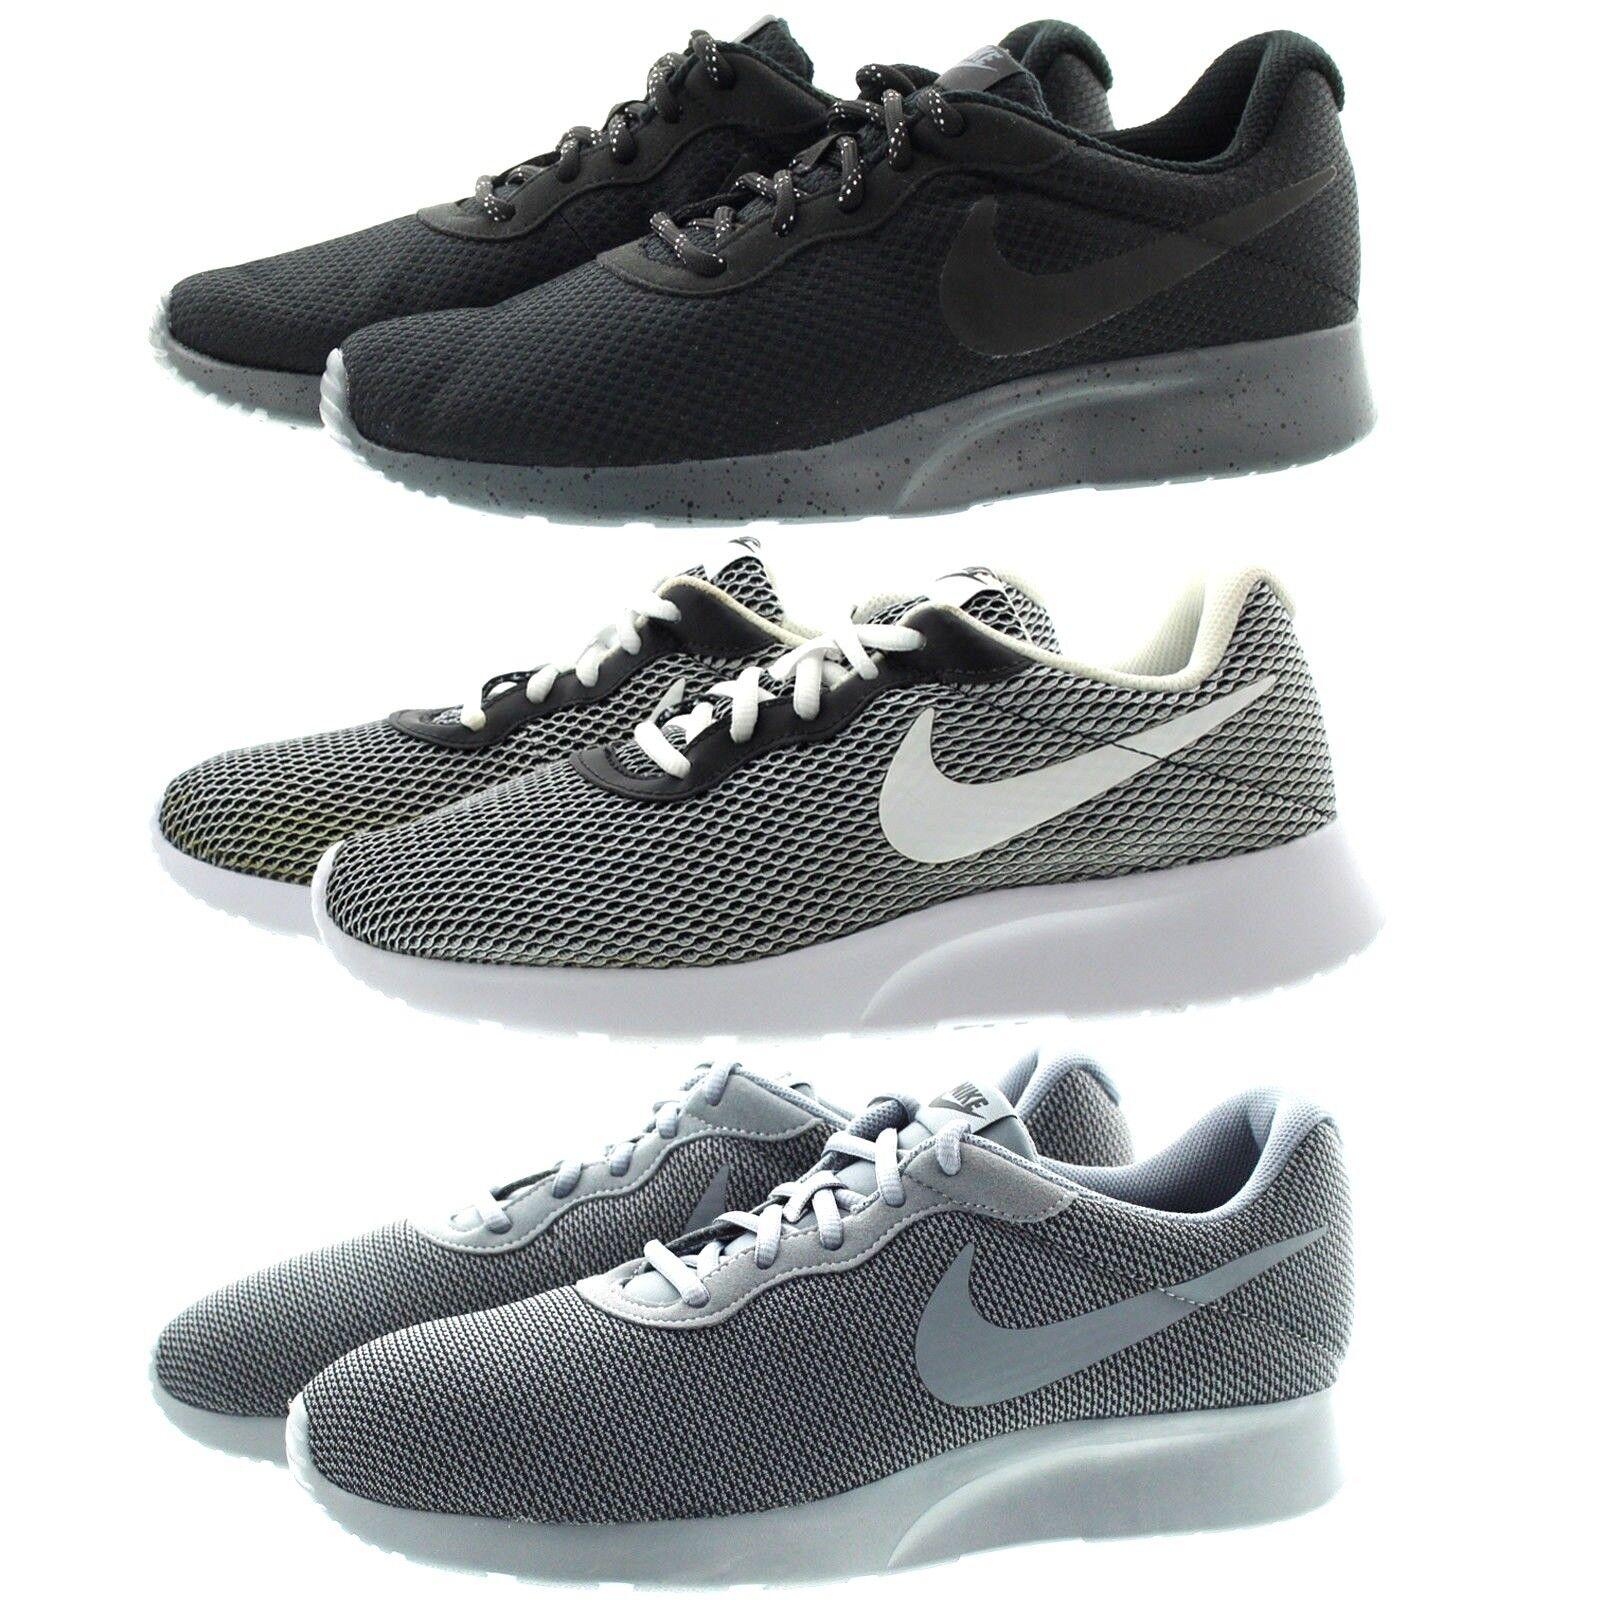 Nike 844887 mens tanjun se lightweight breathable casual Turnschuhe schuhe